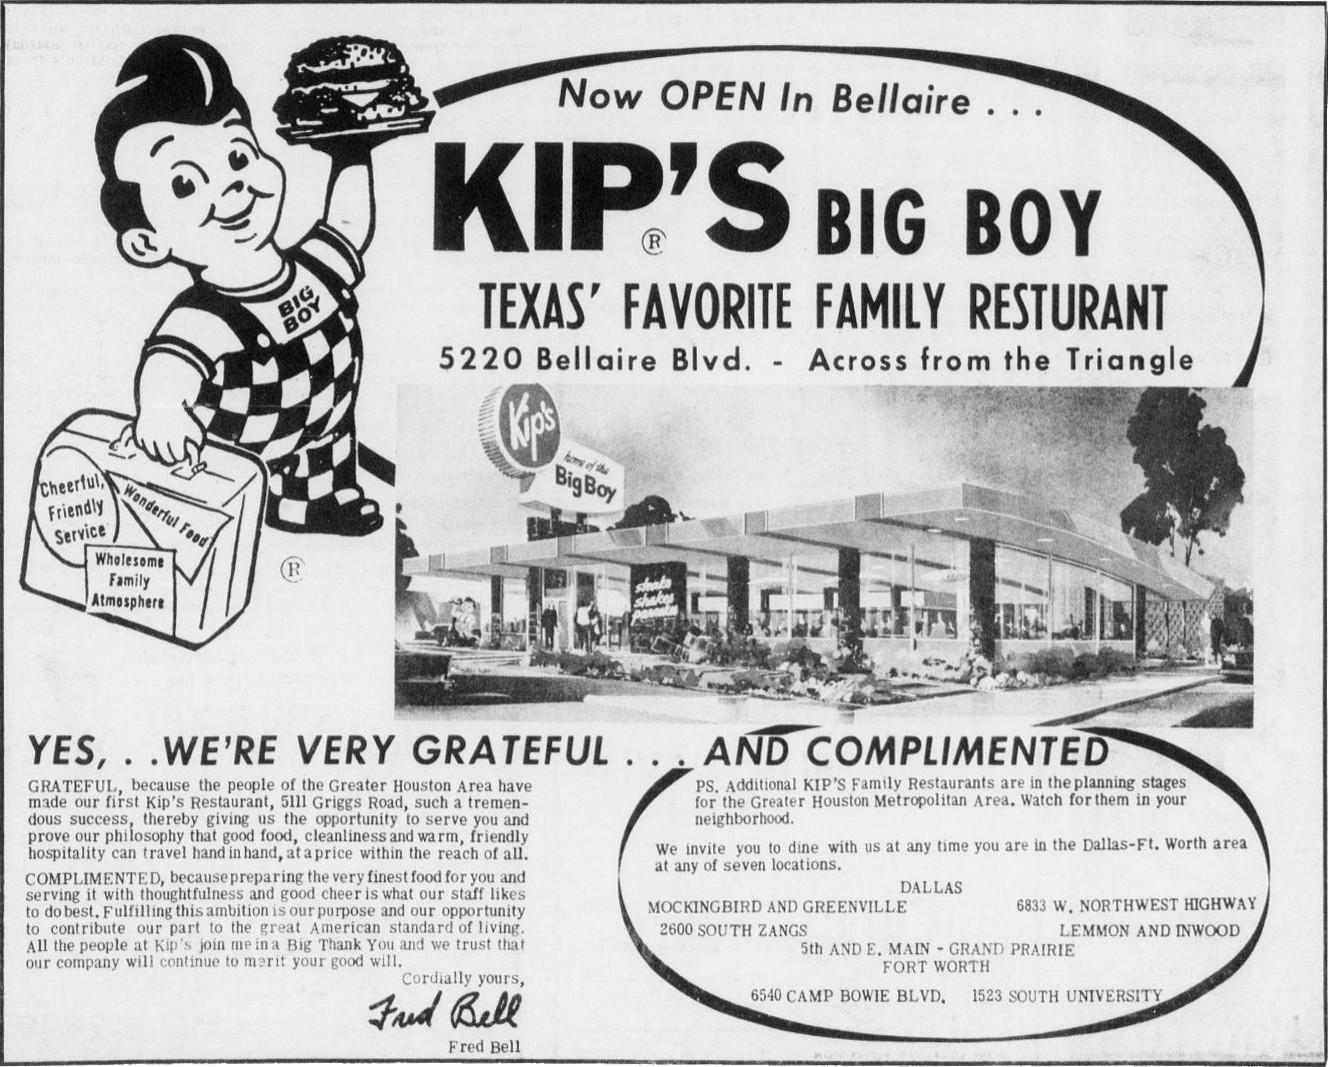 kip-s-big-boy-advertisement.jpg